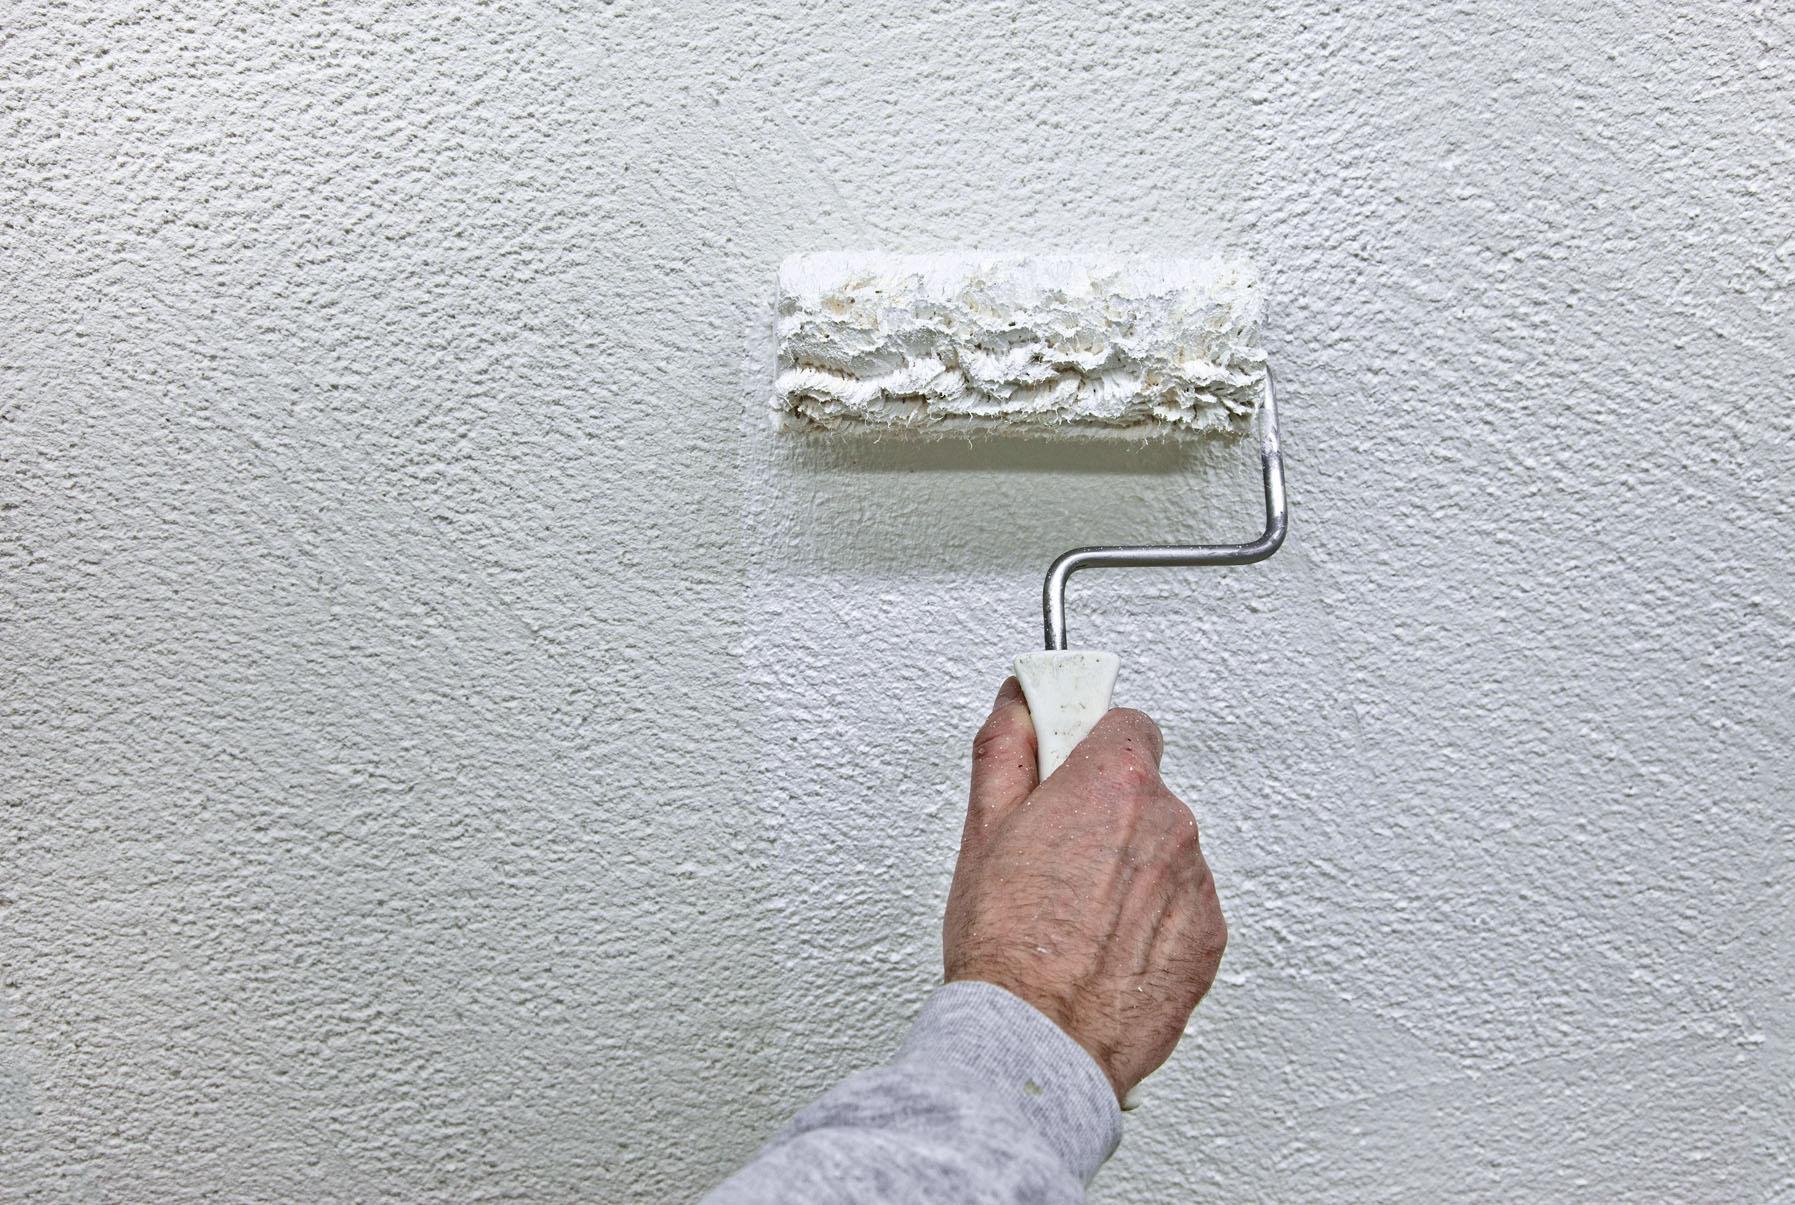 Фото грунтовки стены